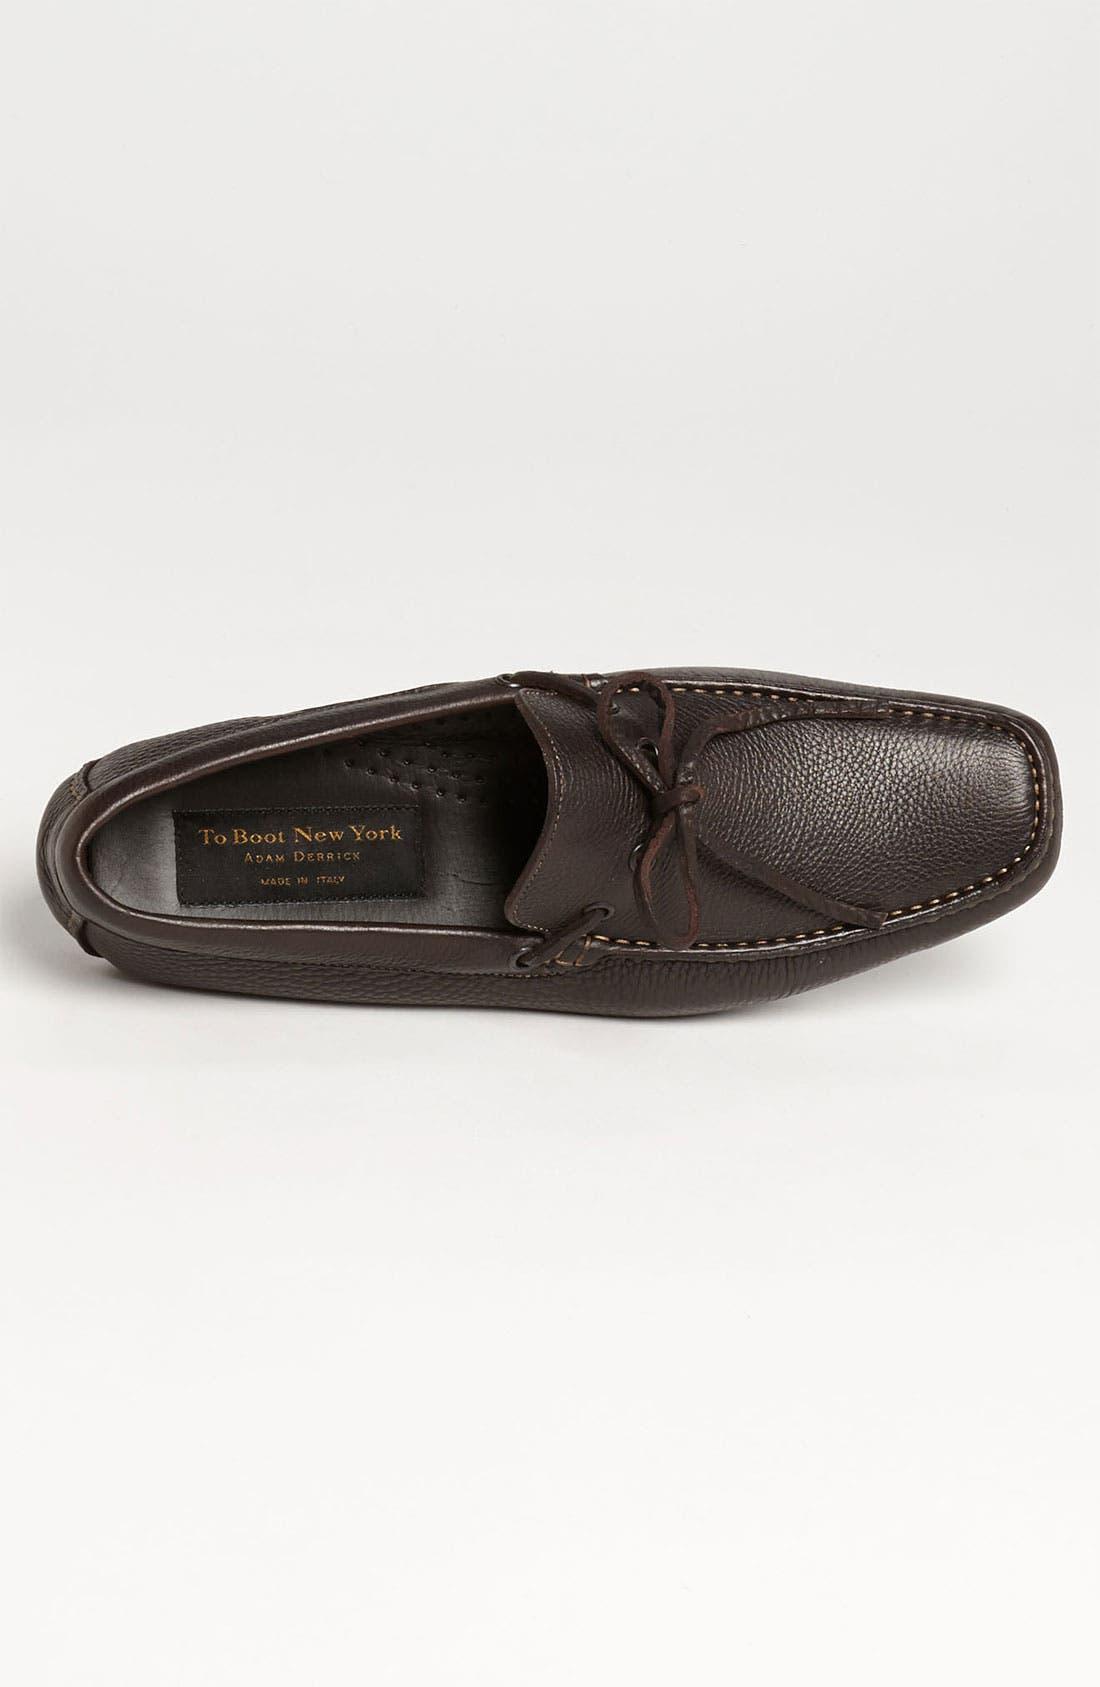 Alternate Image 3  - To Boot New York 'Watson' Driving Shoe